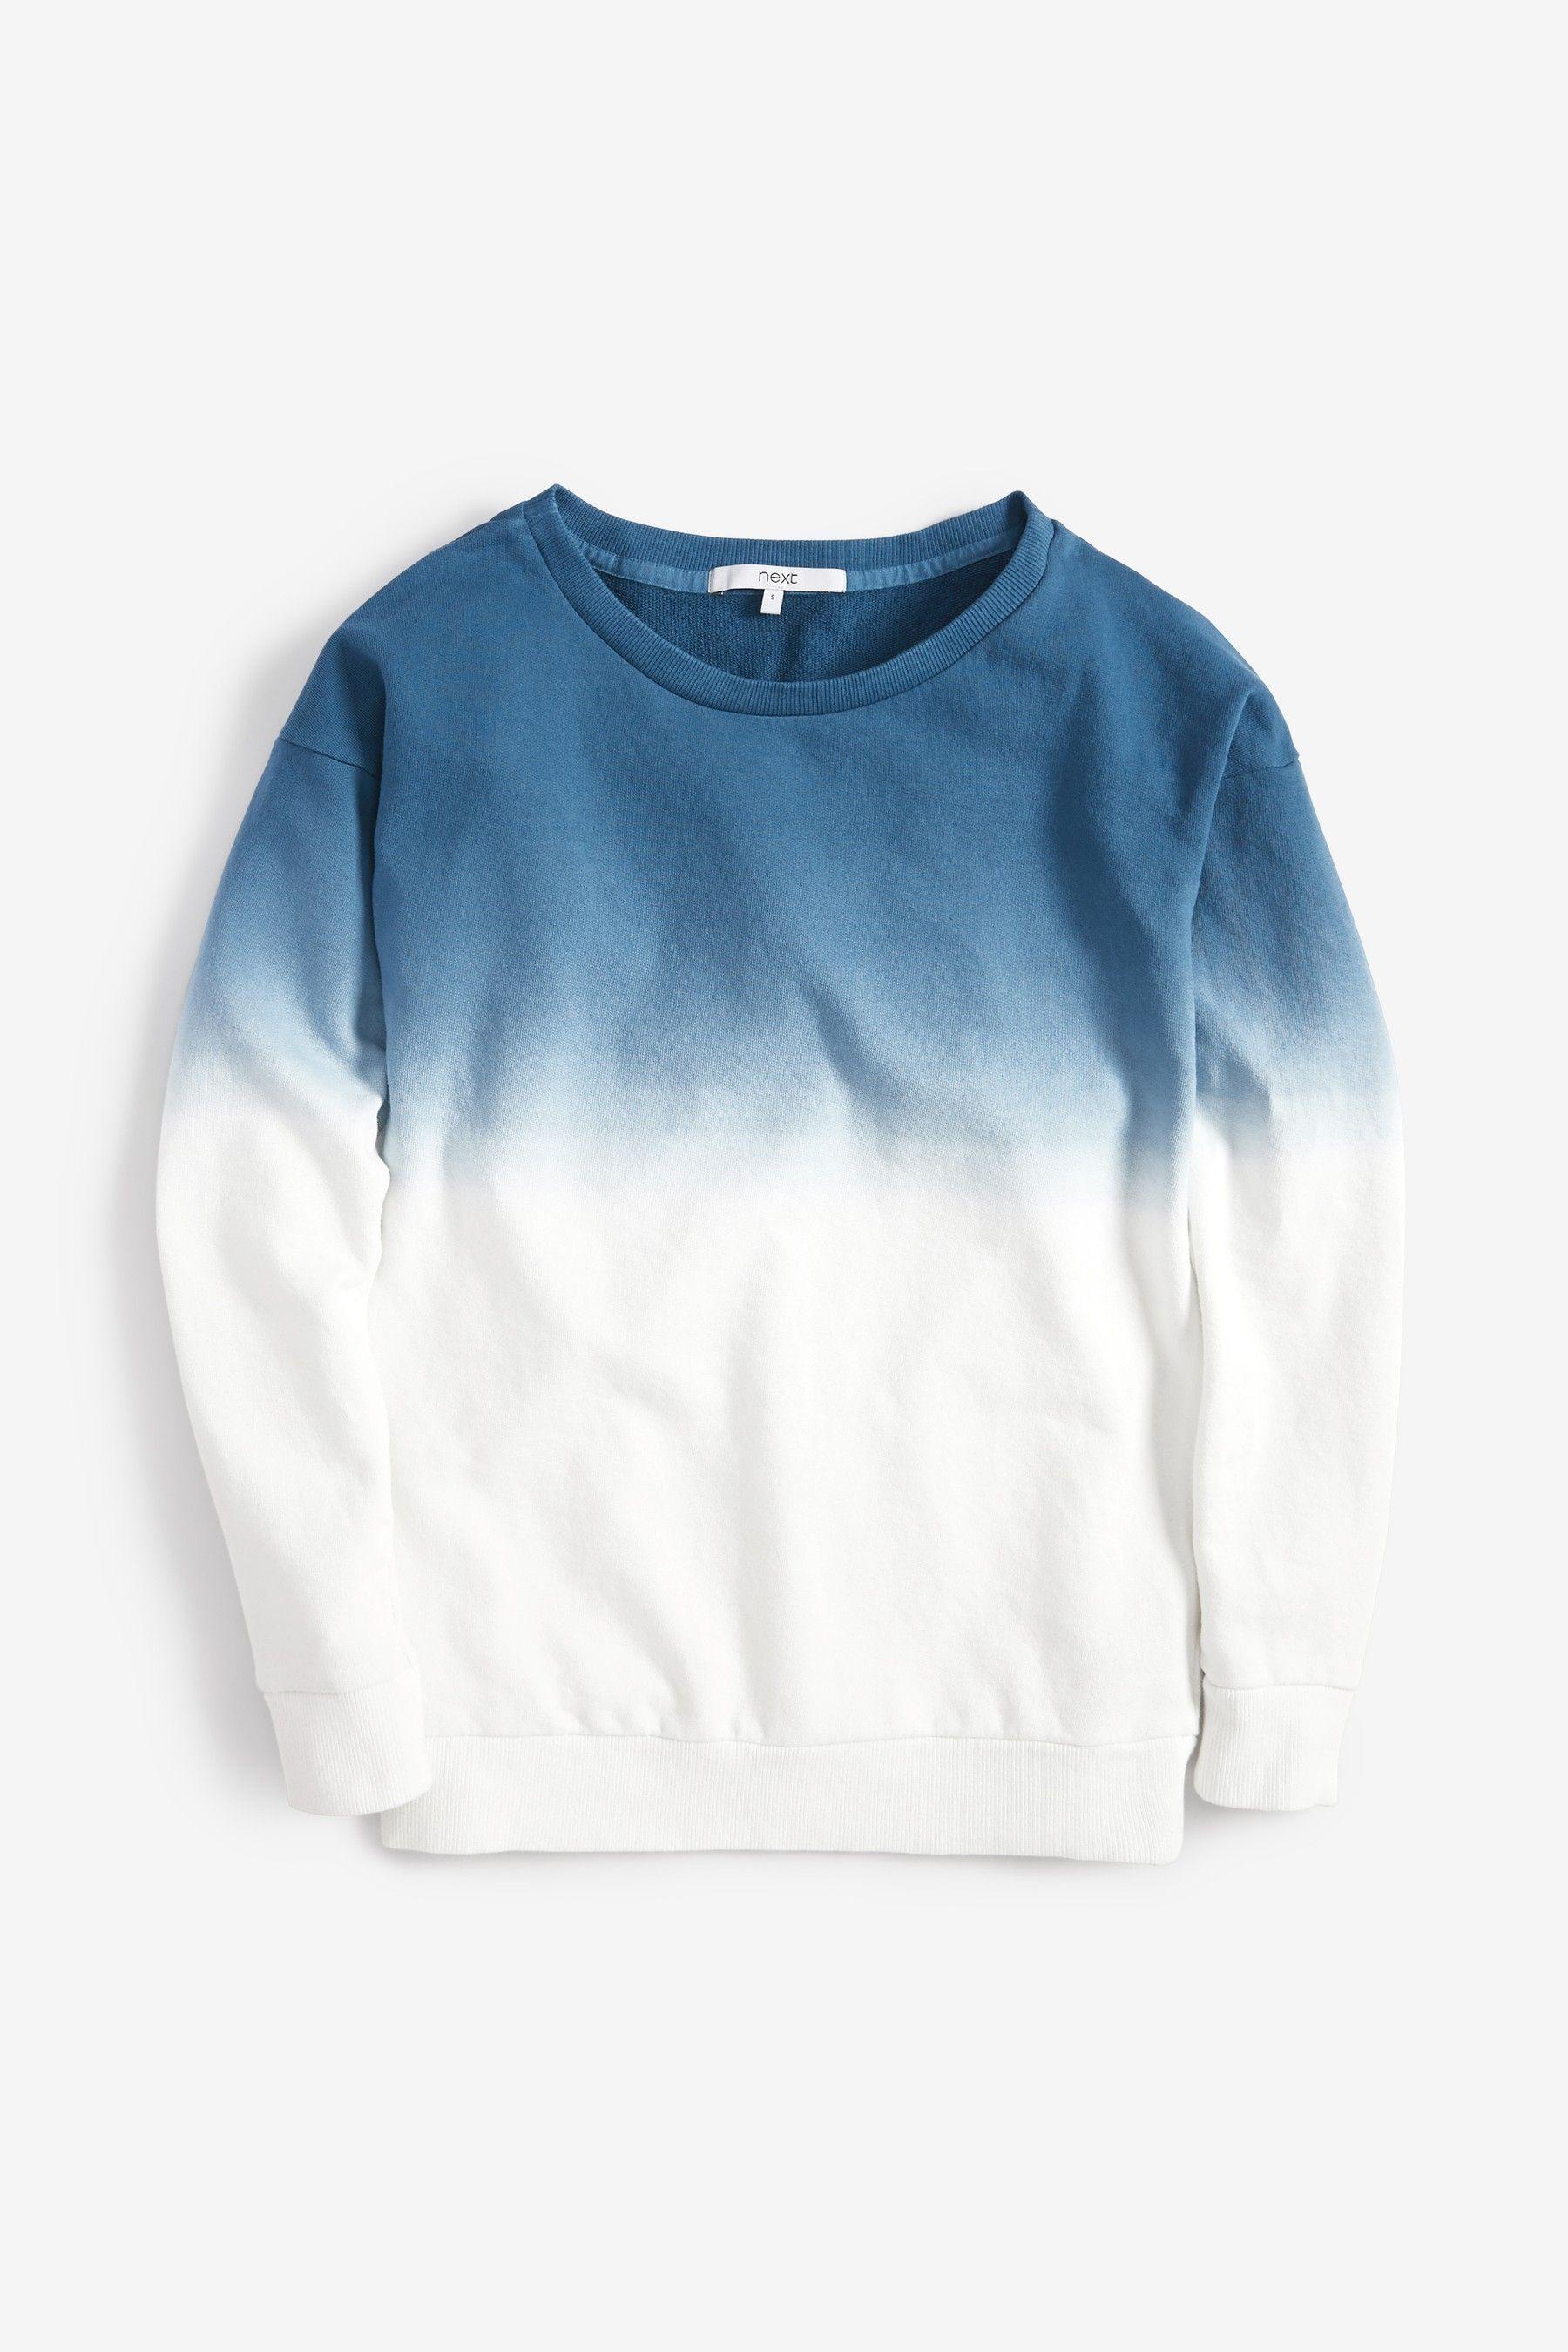 dd6735103b Womens Next Coral Dip Dye Sweatshirt - Pink in 2019   C L O S E T ...